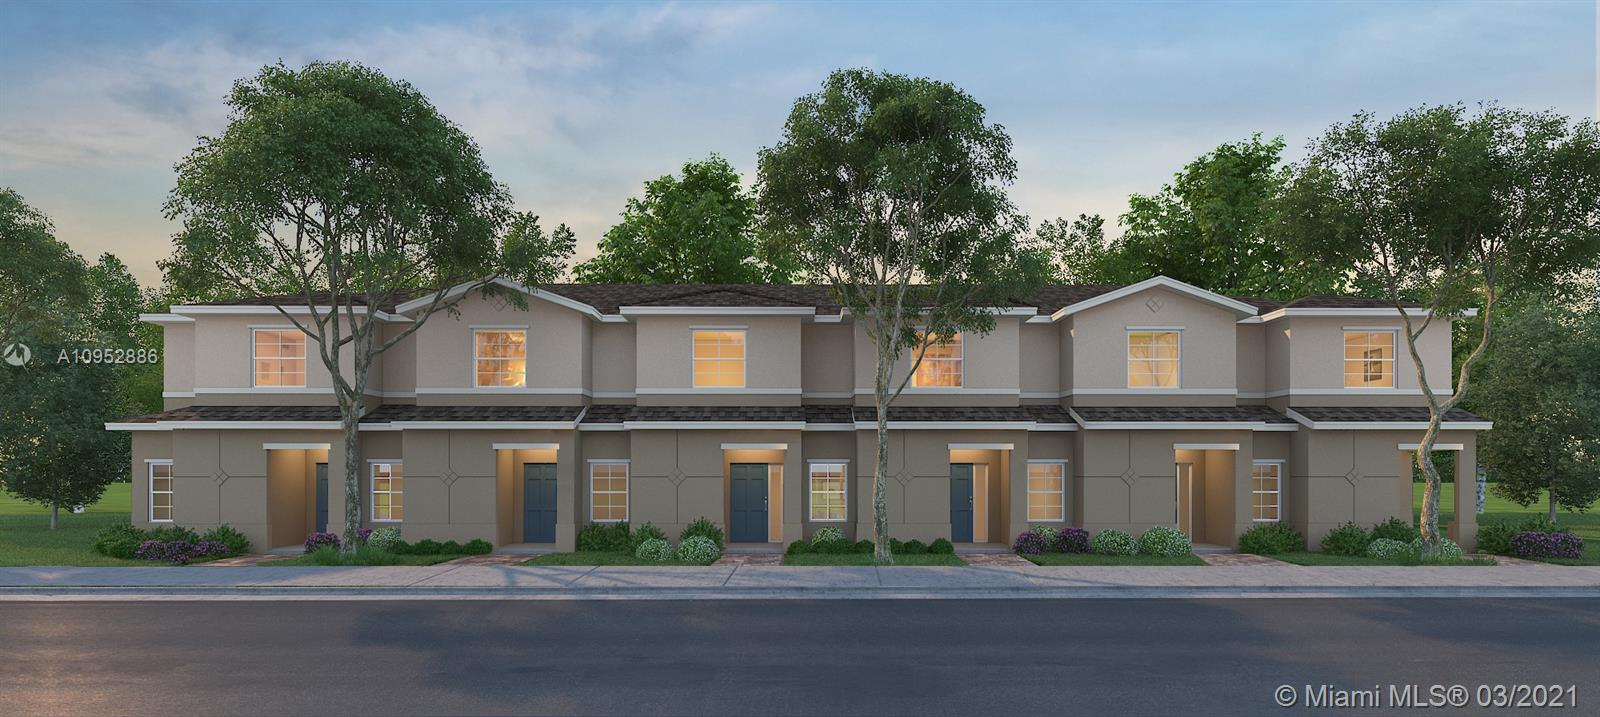 445 NE 5 WAY Property Photo - Florida City, FL real estate listing